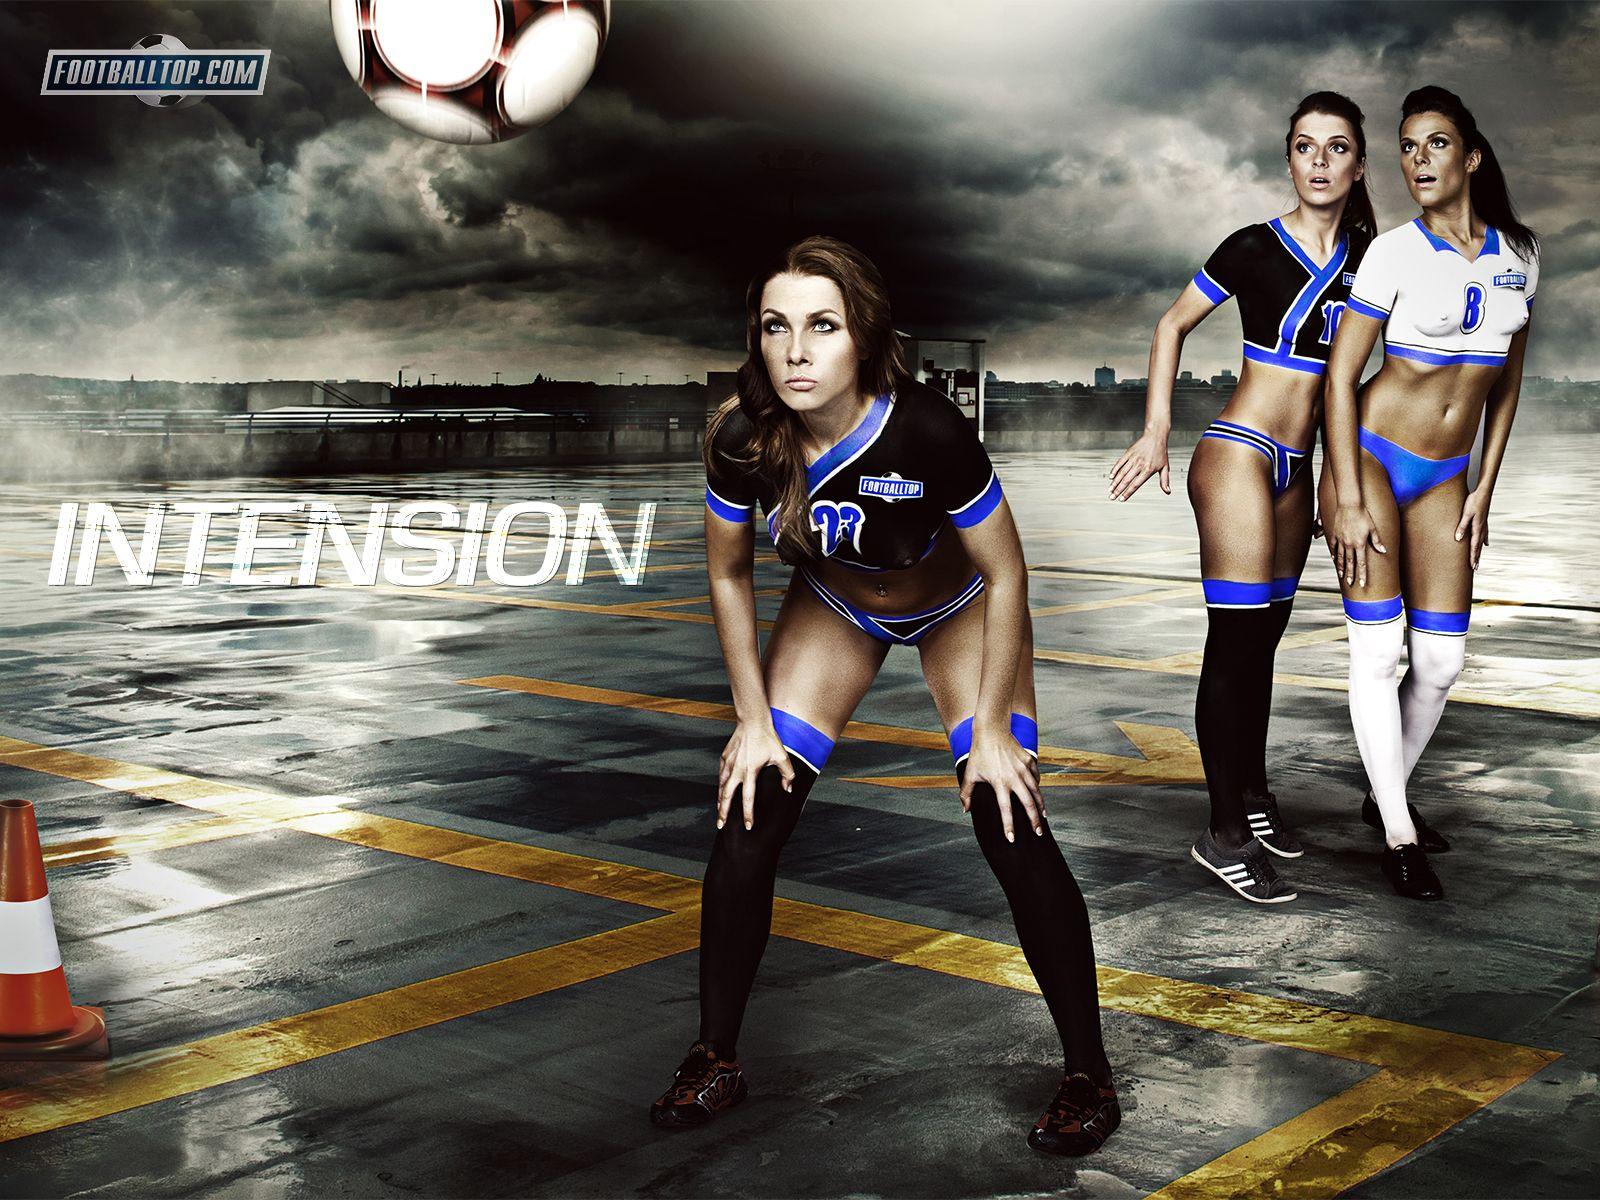 Soccer Girls Wallpaper Free: Naked Girls, Football And Parking